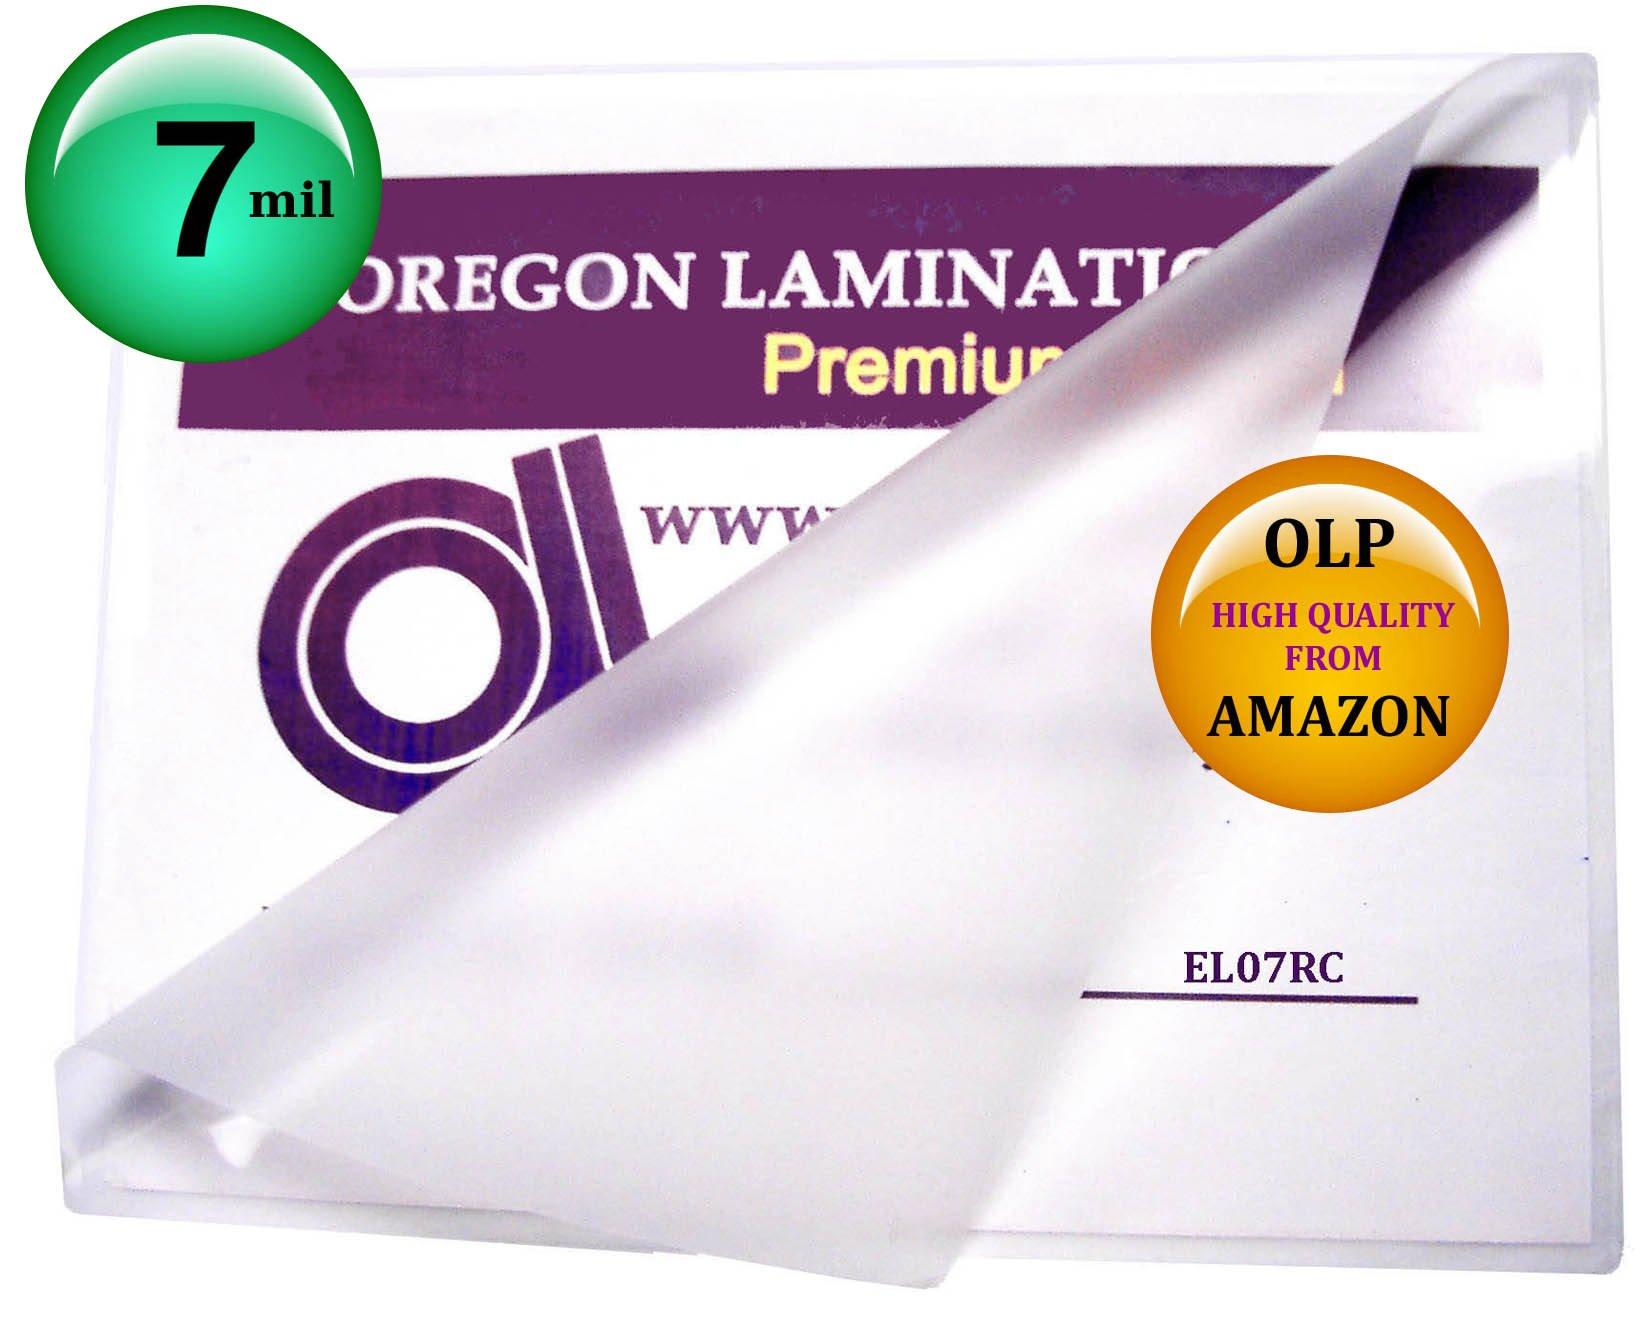 7 Mil 12 x 18 Menu Laminating Pouches Hot Laminator Sleeves Qty 100 by Oregon Lamination Premium